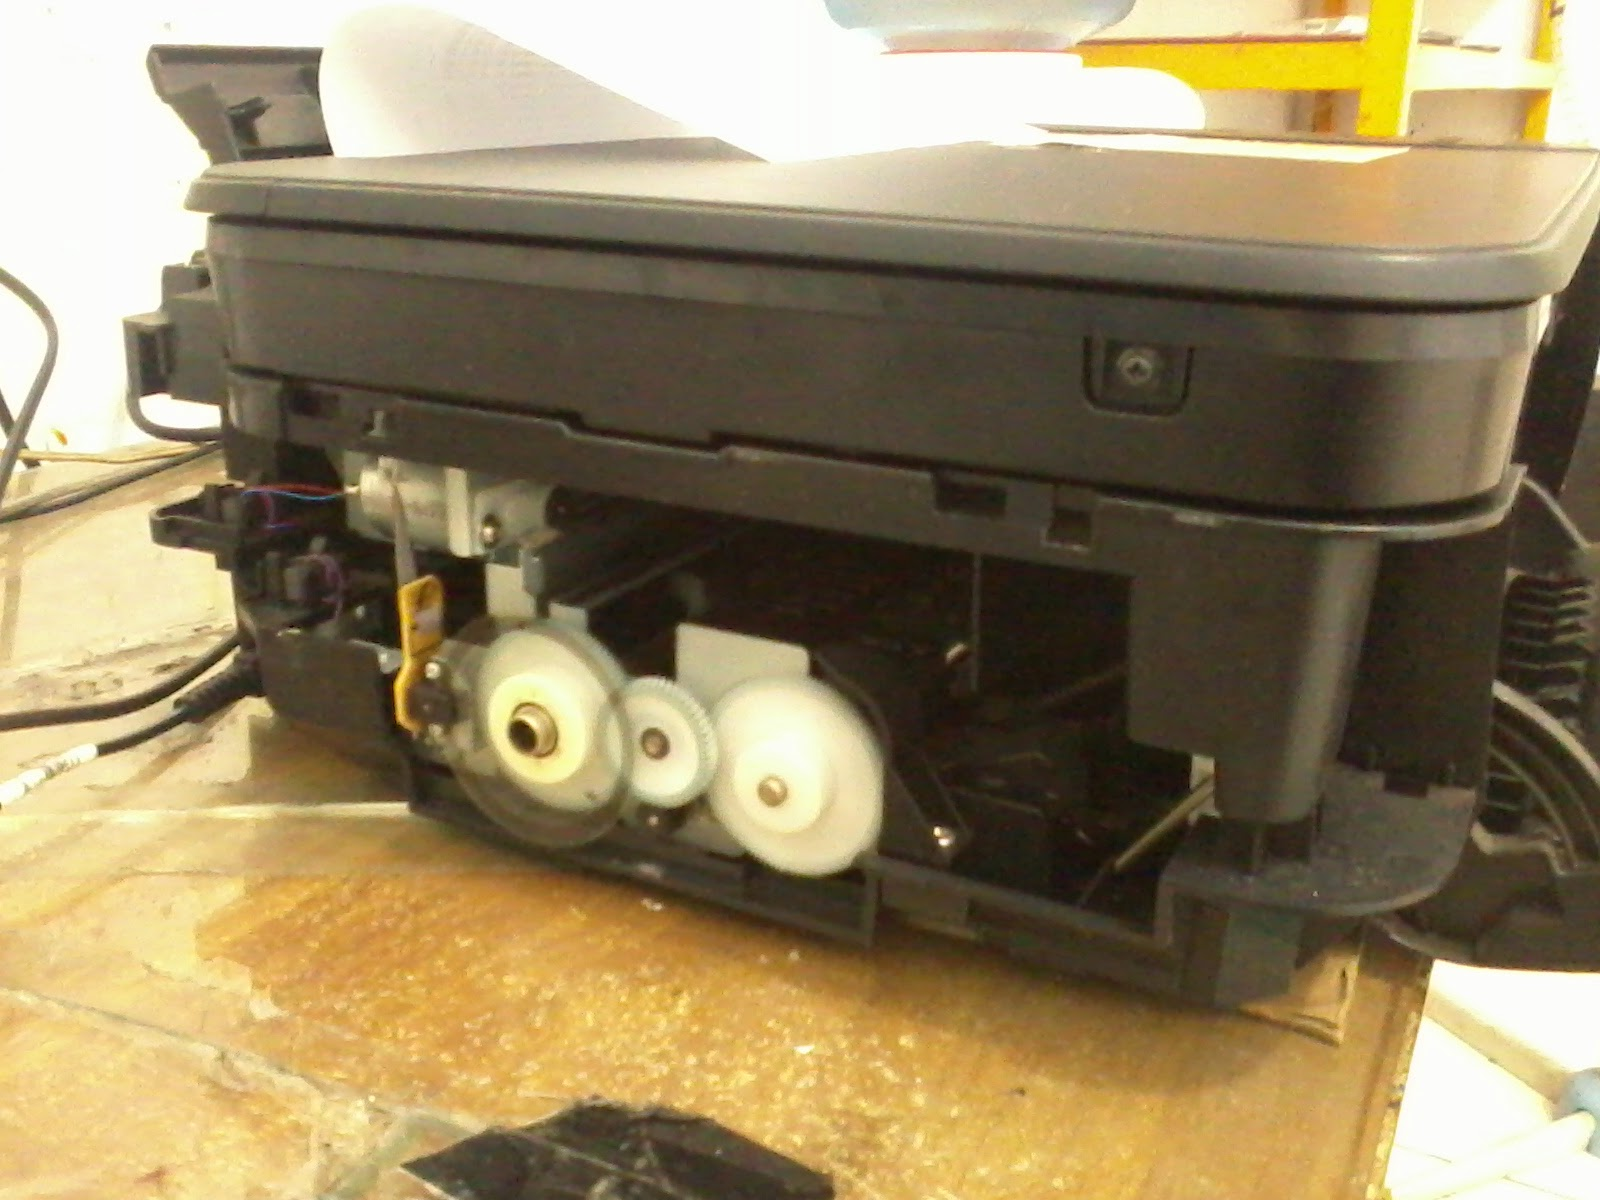 Mengatasi Error P02 Pada MP287